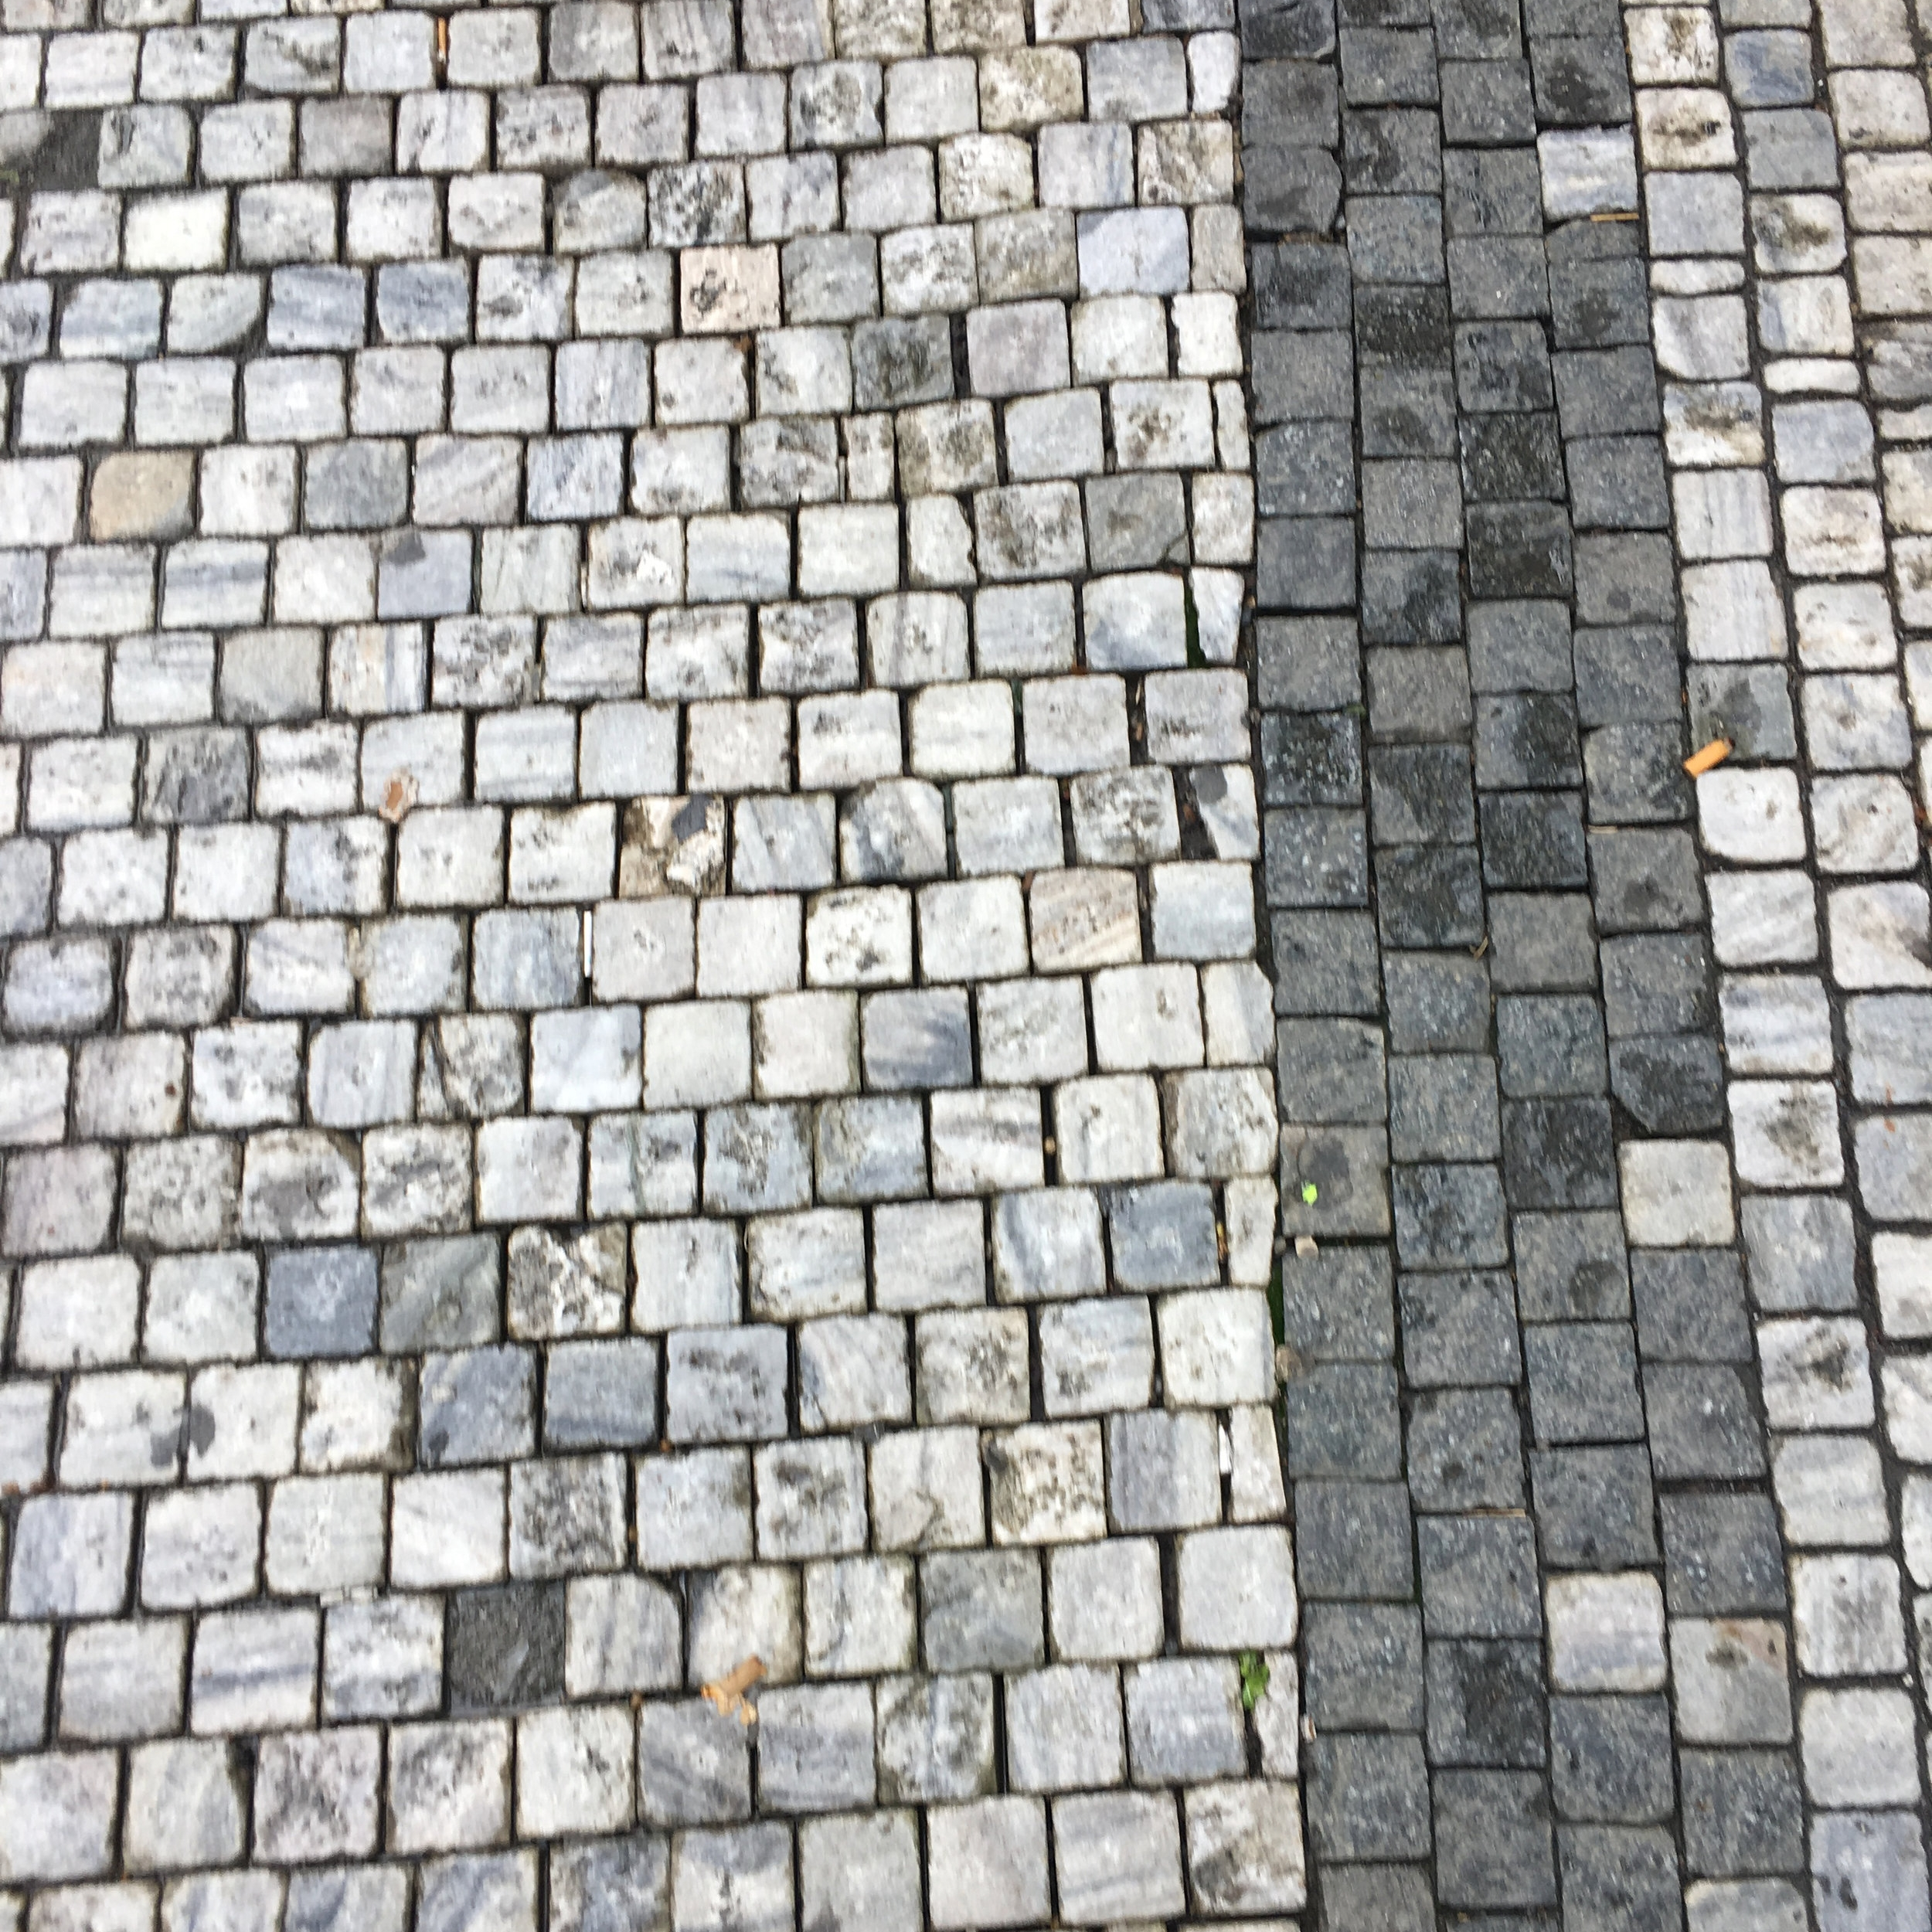 Organized-Stones-Walk.jpg